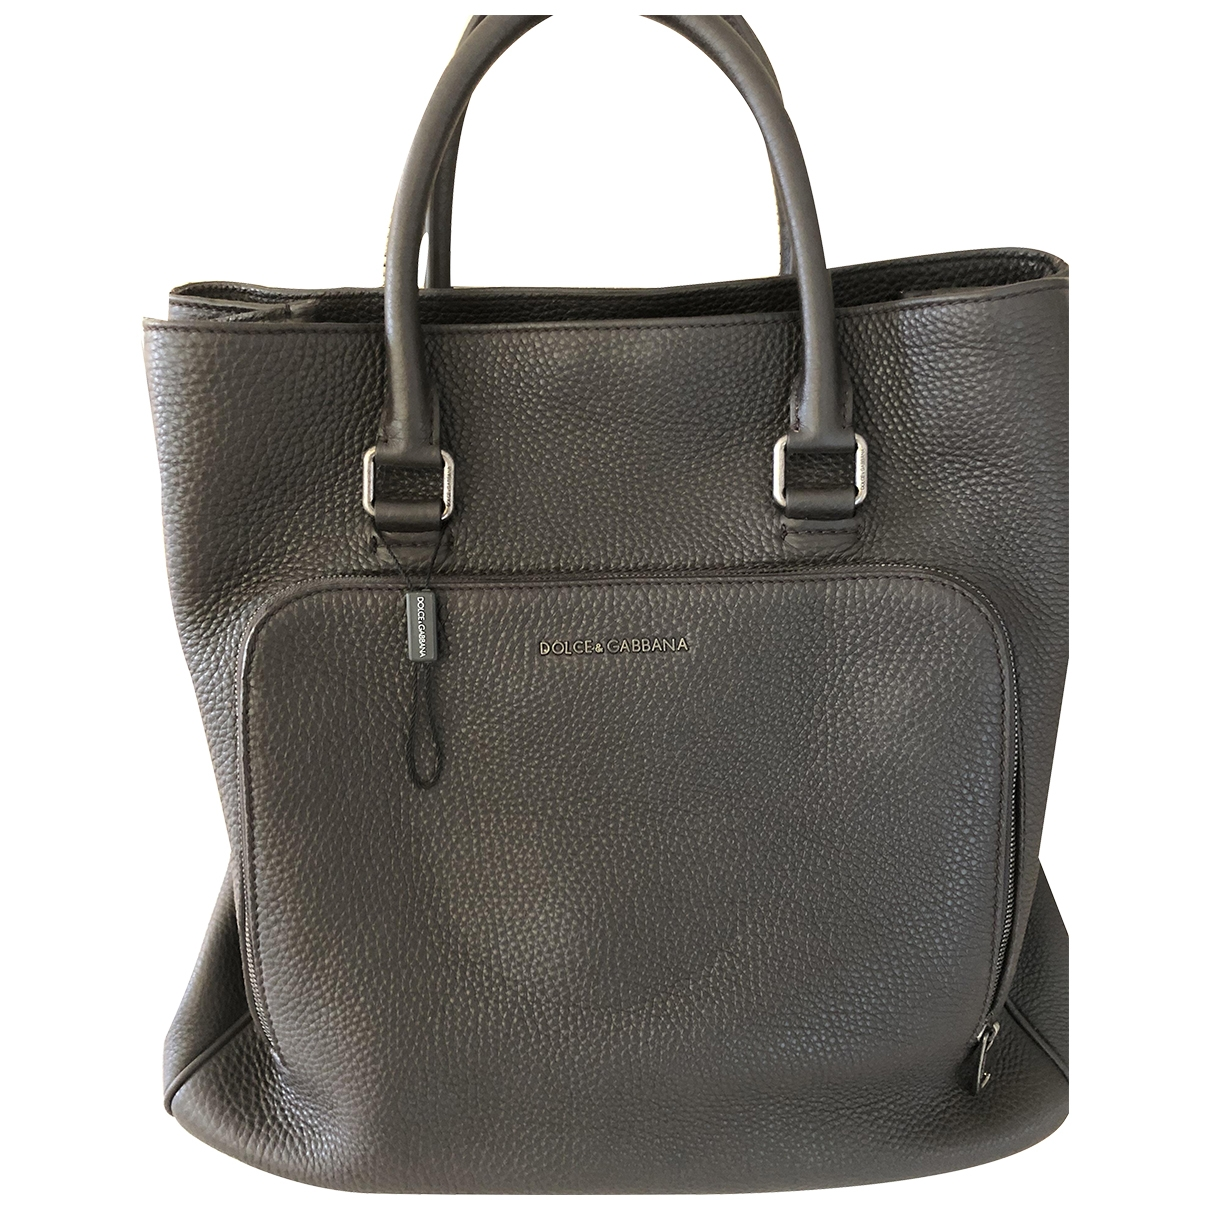 Dolce & Gabbana \N Brown Leather bag for Men \N